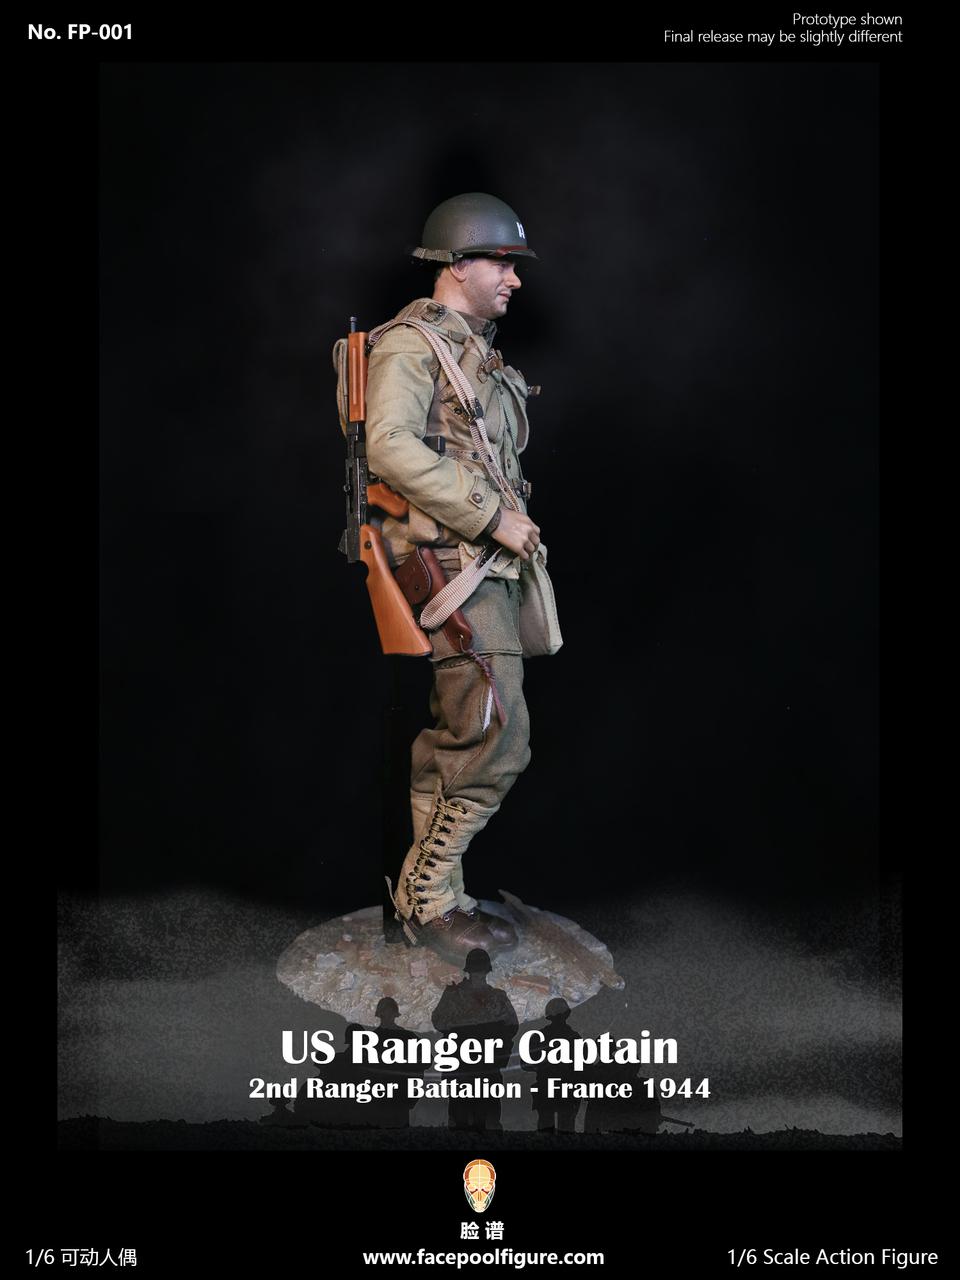 Facepoolfigure FP001 WWII US Captain 2nd Ranger Battalion France 1944 1//6 FIGURE